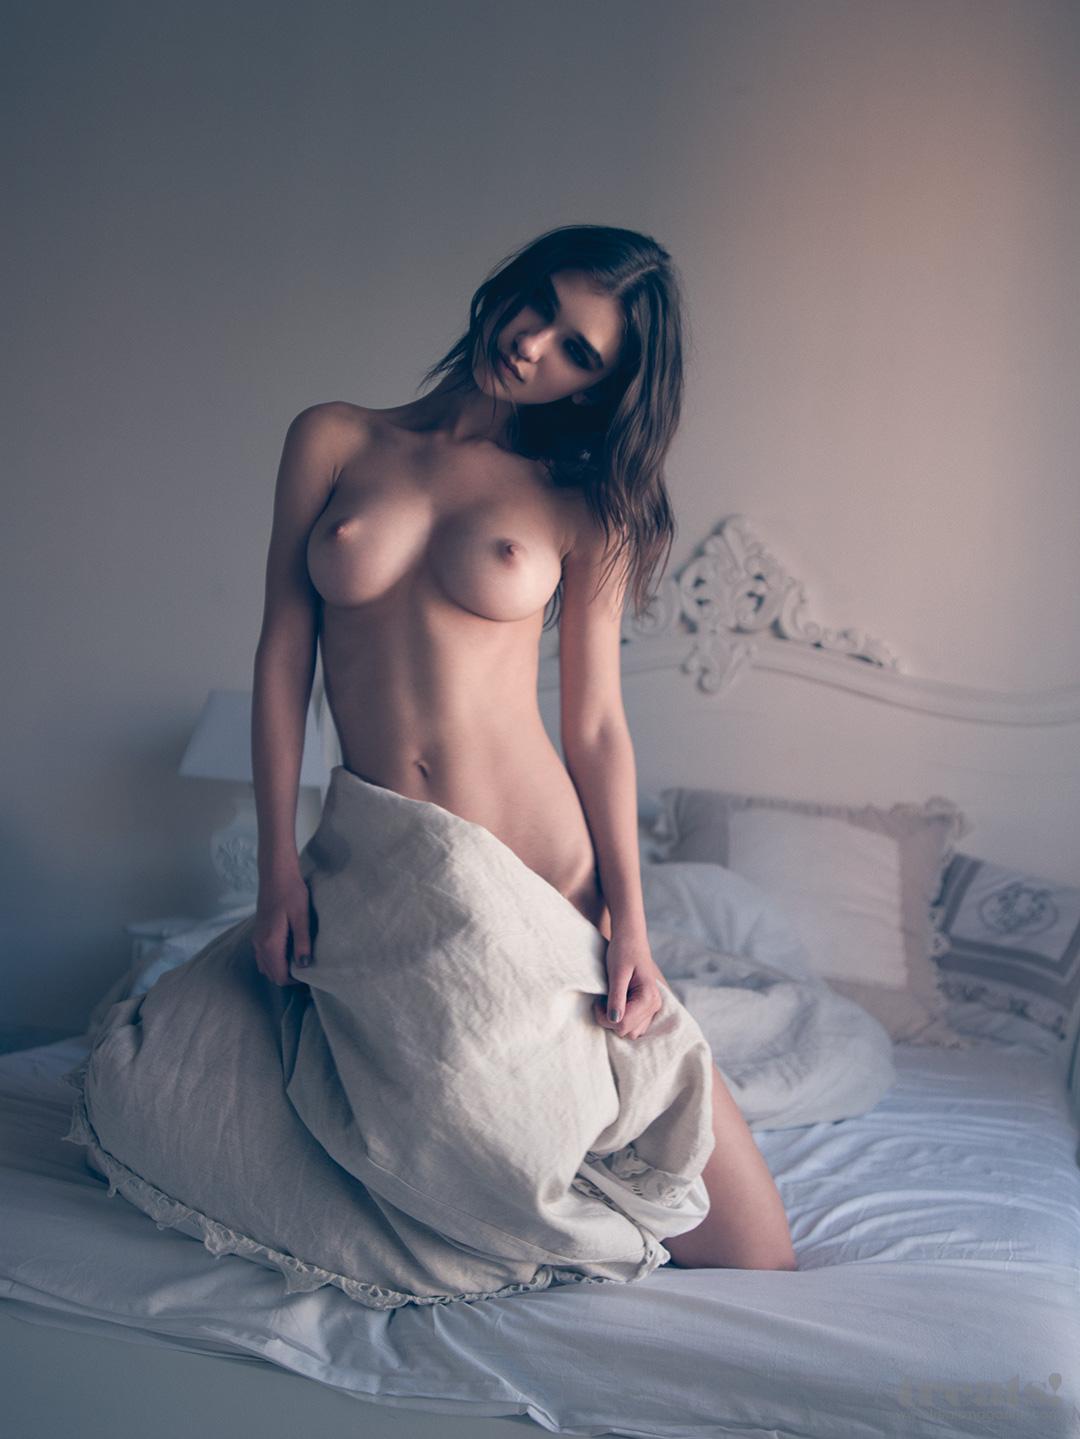 Paula Bulczynska_Dennison Bertram_01